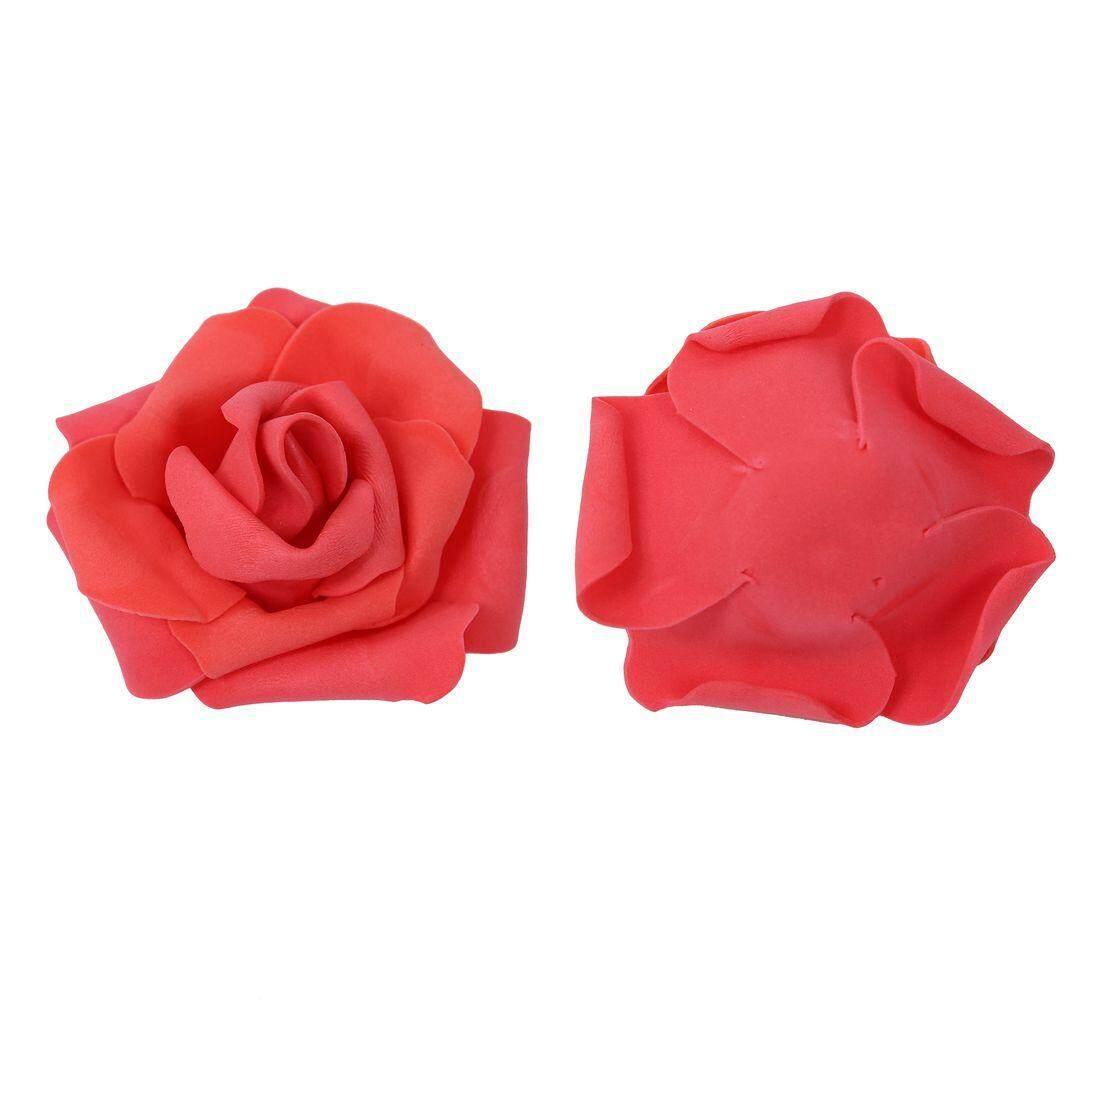 24 M Plastik Kain Sutra Mawar Bunga Ivy Tanaman Merambat Gantung Garland Pernikahan Dekorasi. 340